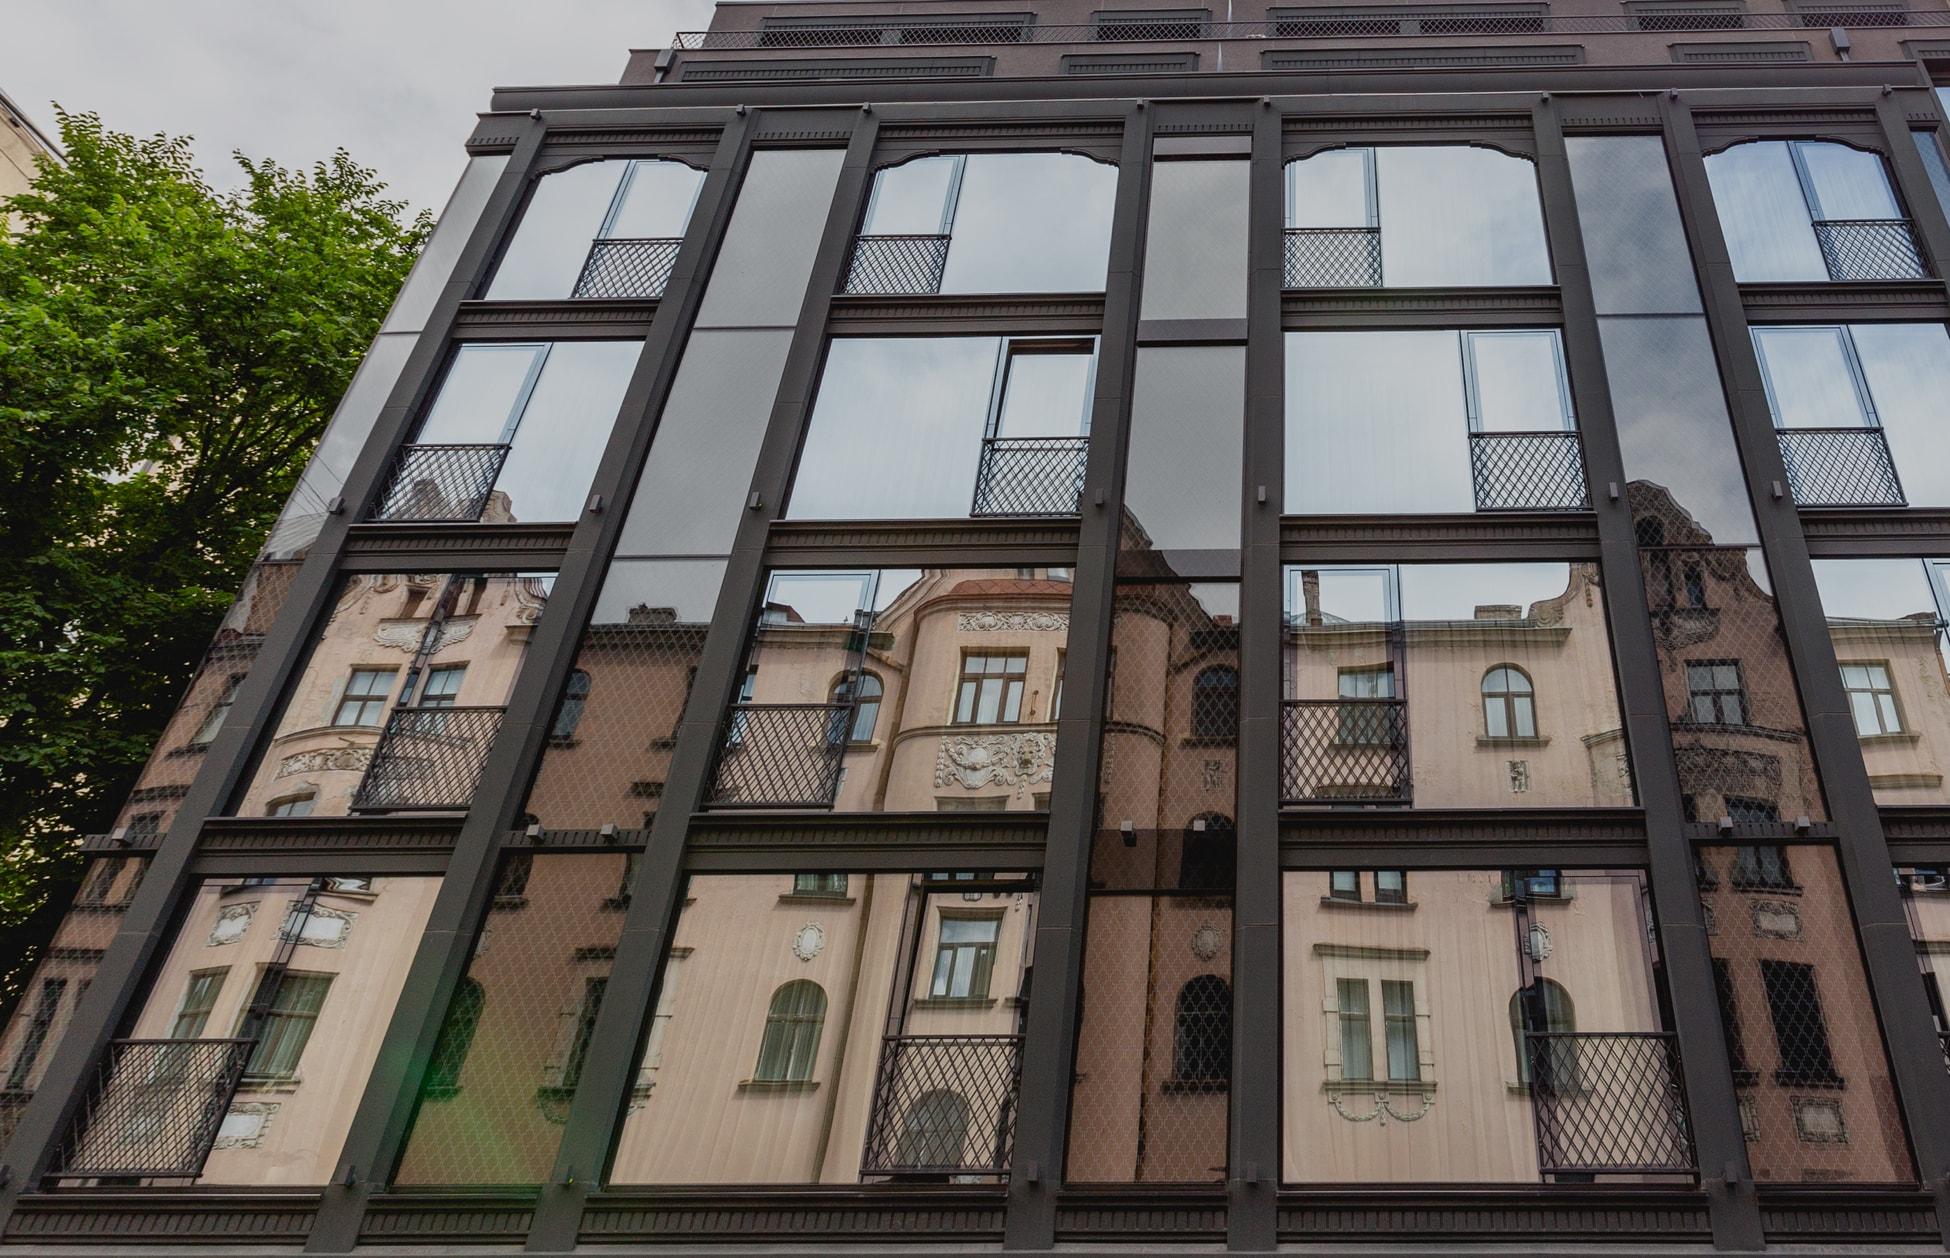 Новостройка гостиничного здания, Базницас 18, Рига